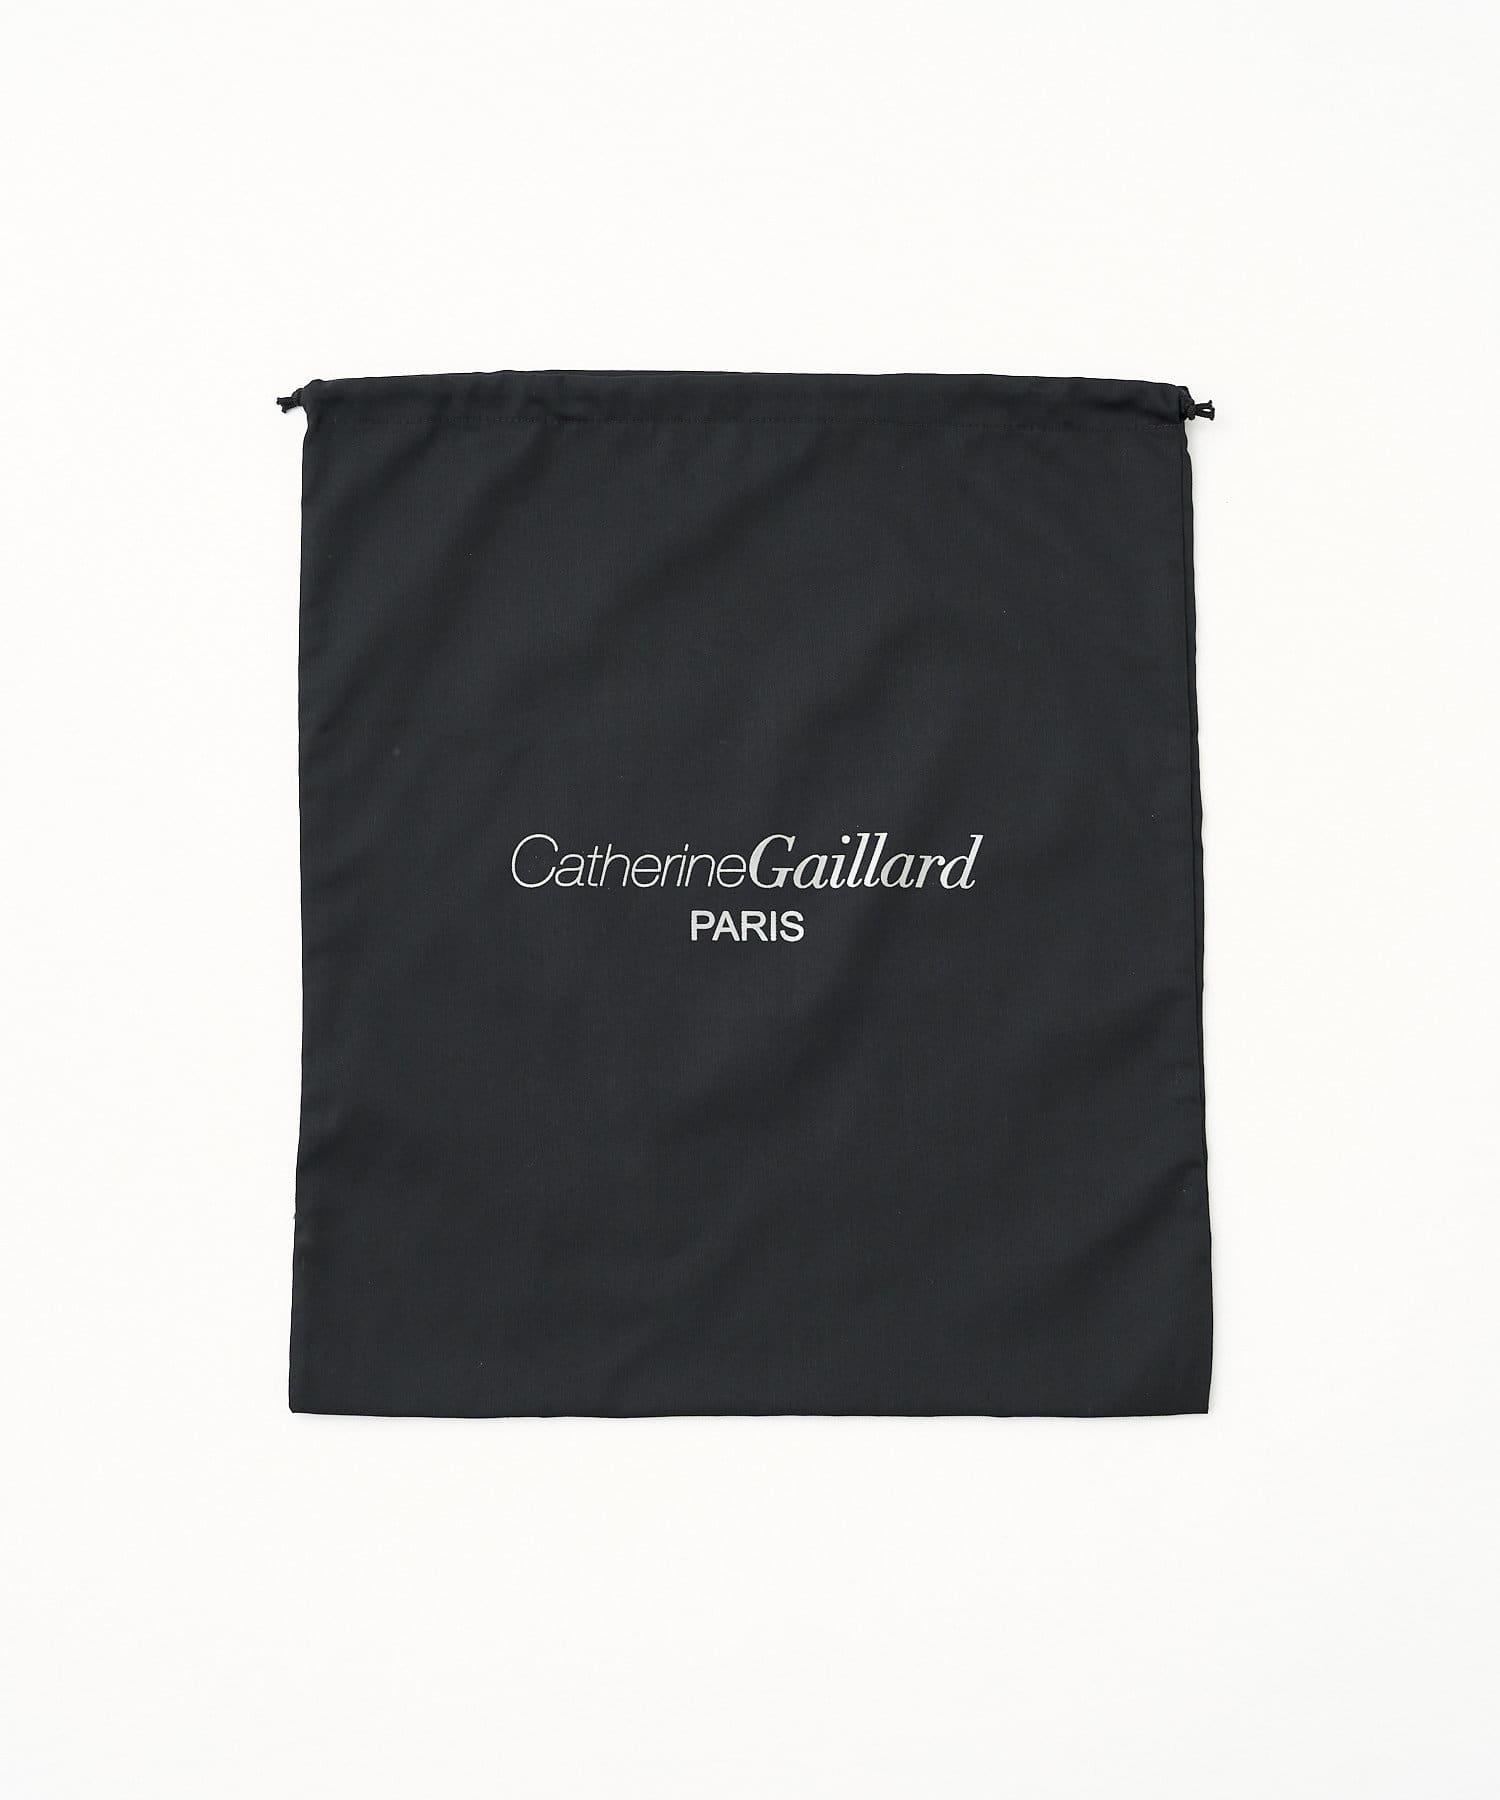 LIVETART(リヴェタート) 《Catherine Gaillard》ショルダーバッグ